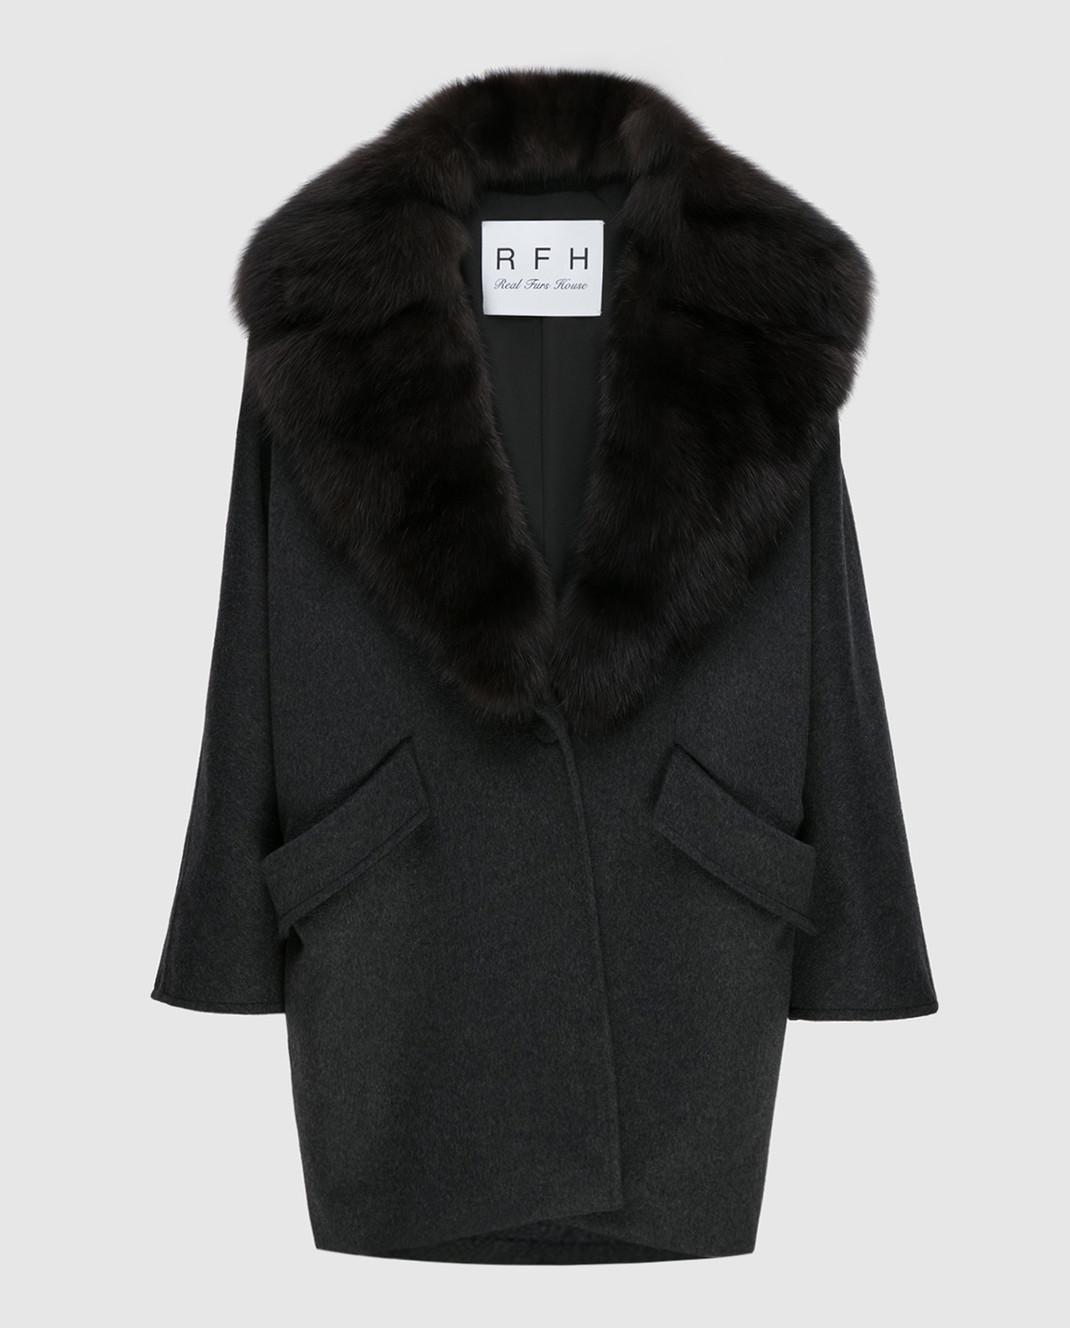 Real Furs House Черное пальто QSR433